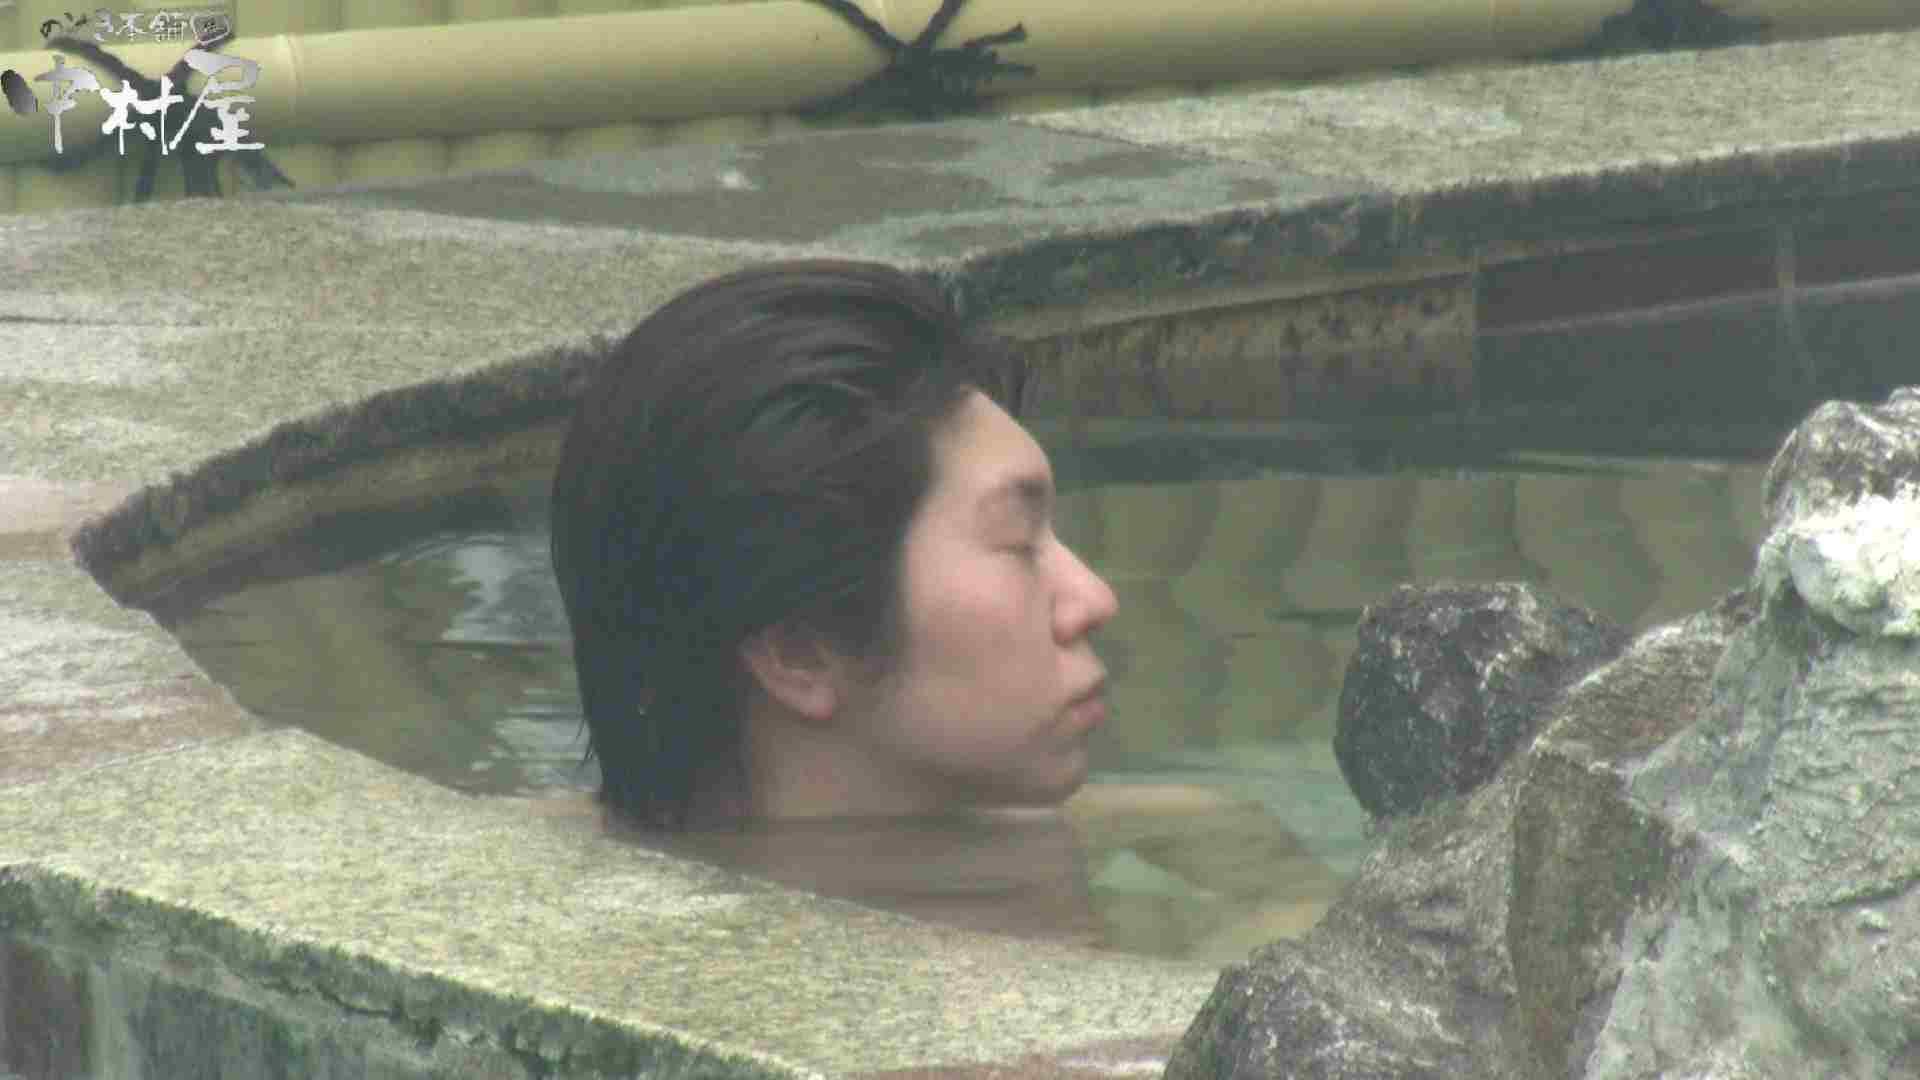 Aquaな露天風呂Vol.907 盗撮特撮 | OLのプライベート  12pic 7